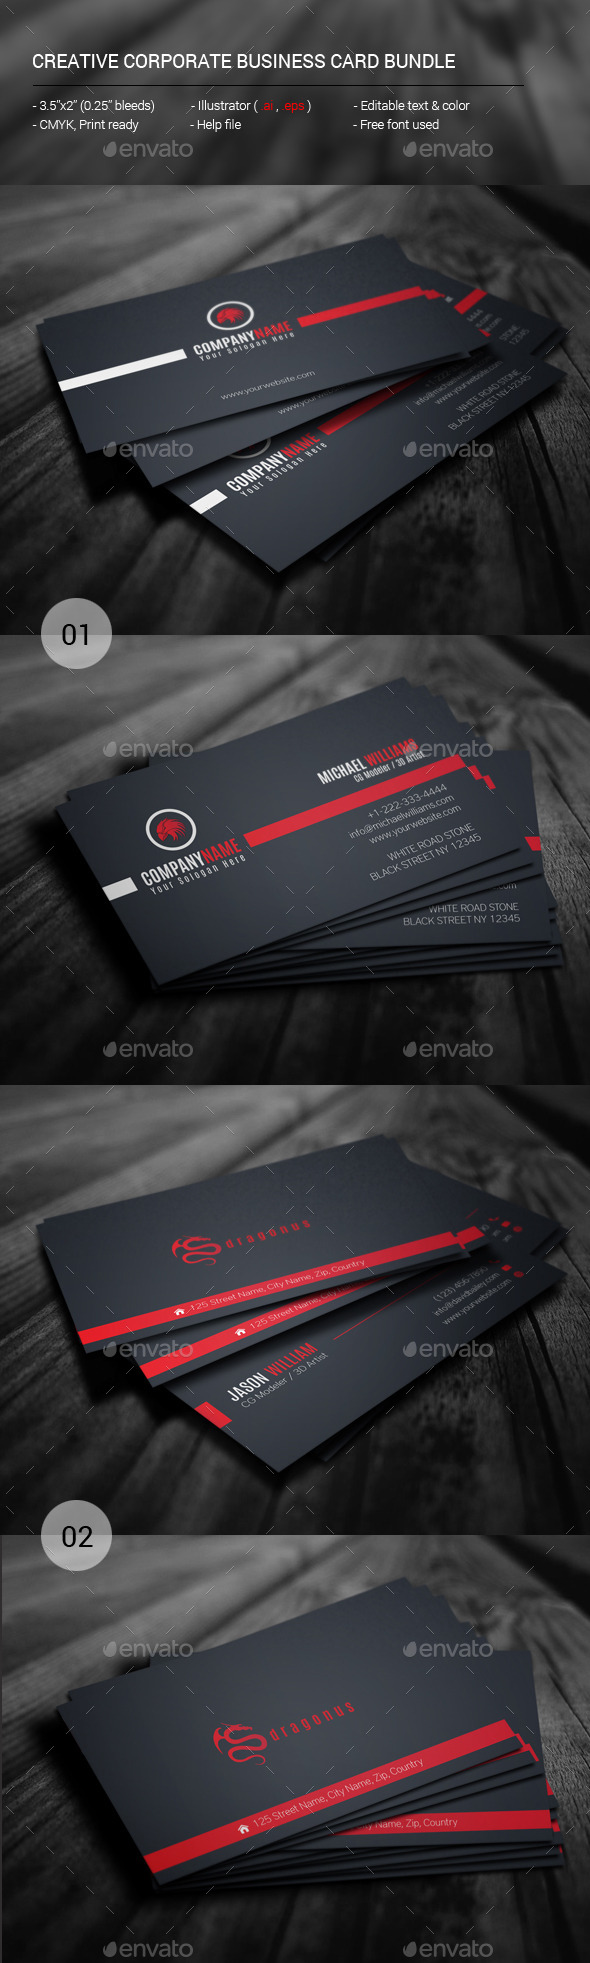 GraphicRiver Creative Corporate Business Card Bundle 11407450